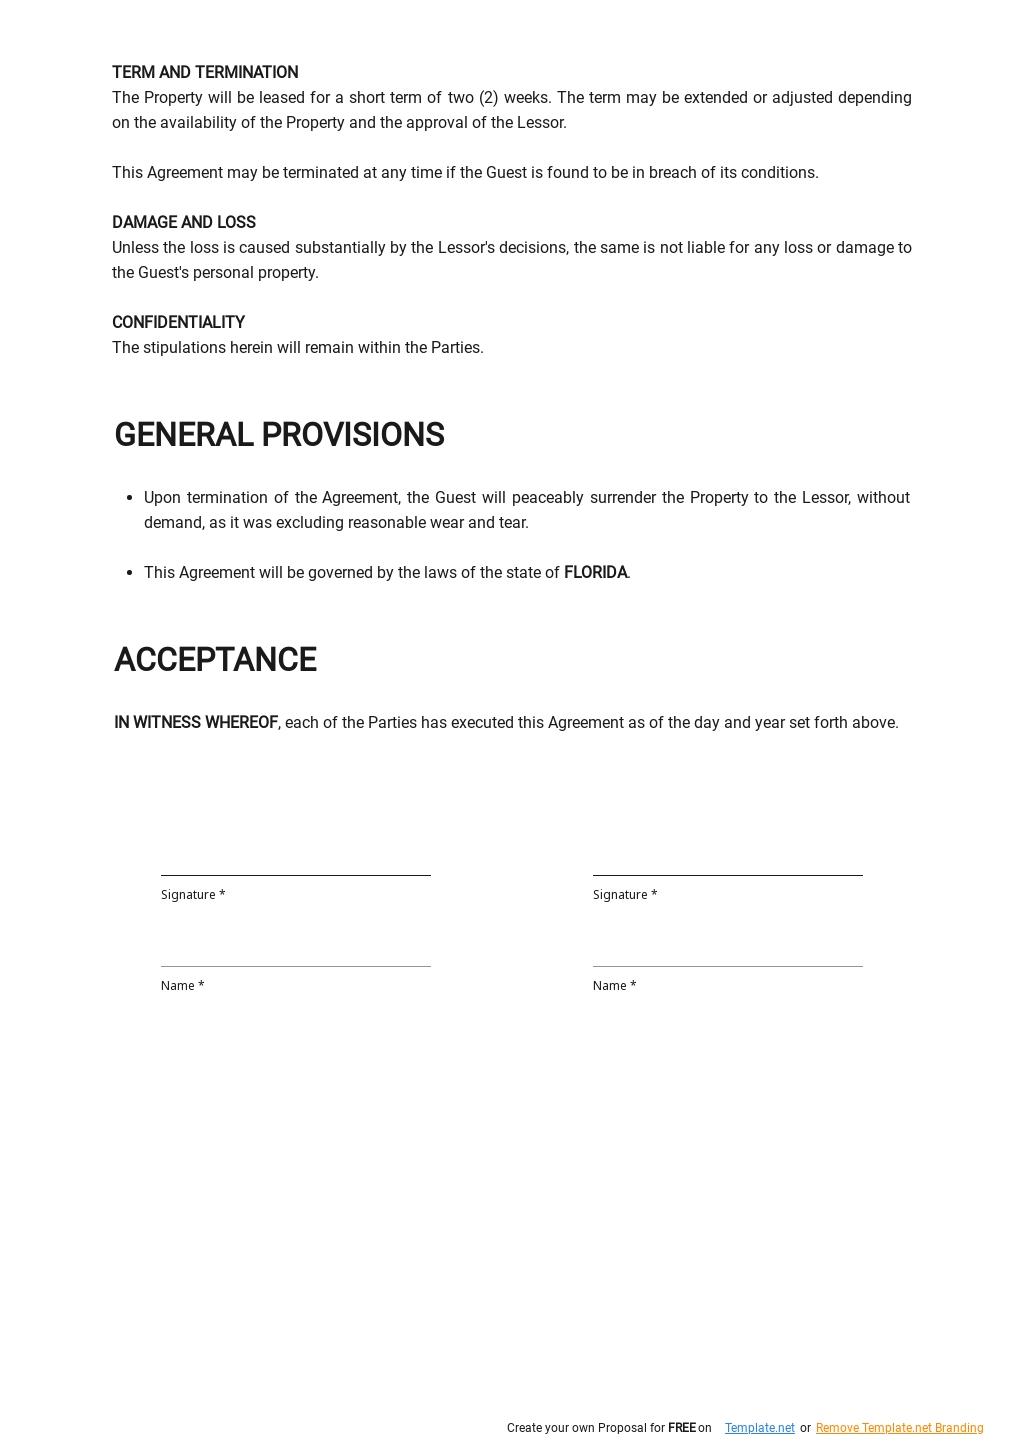 Free Short Term Vacation Rental Agreement Template 2.jpe